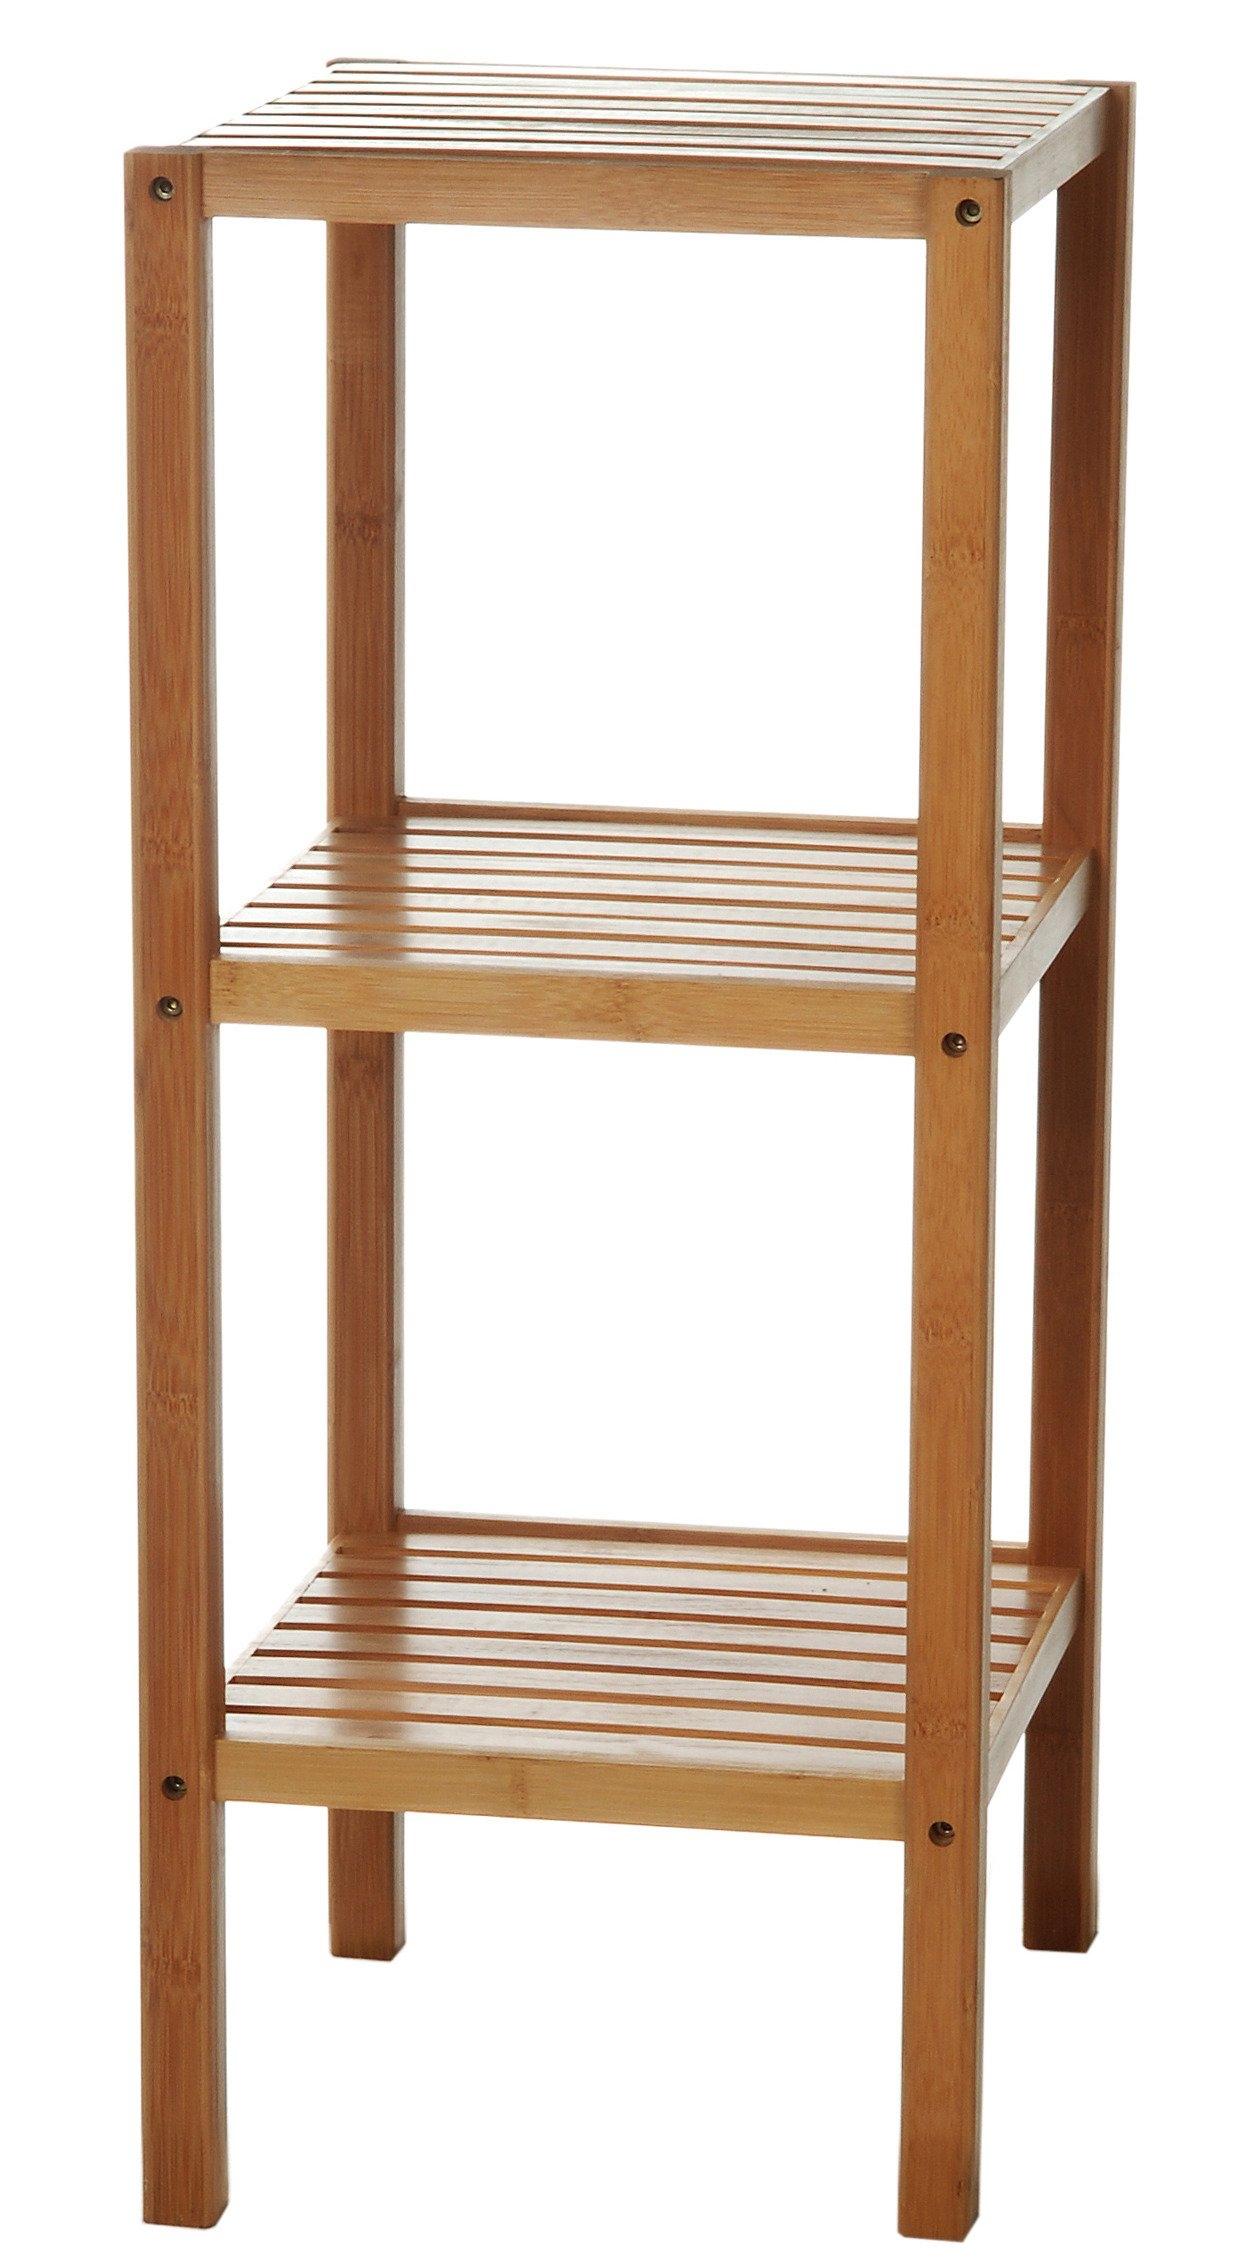 Badkamerrekje »bamboe«, Breedte 34 cm online verkrijgbaar | OTTO